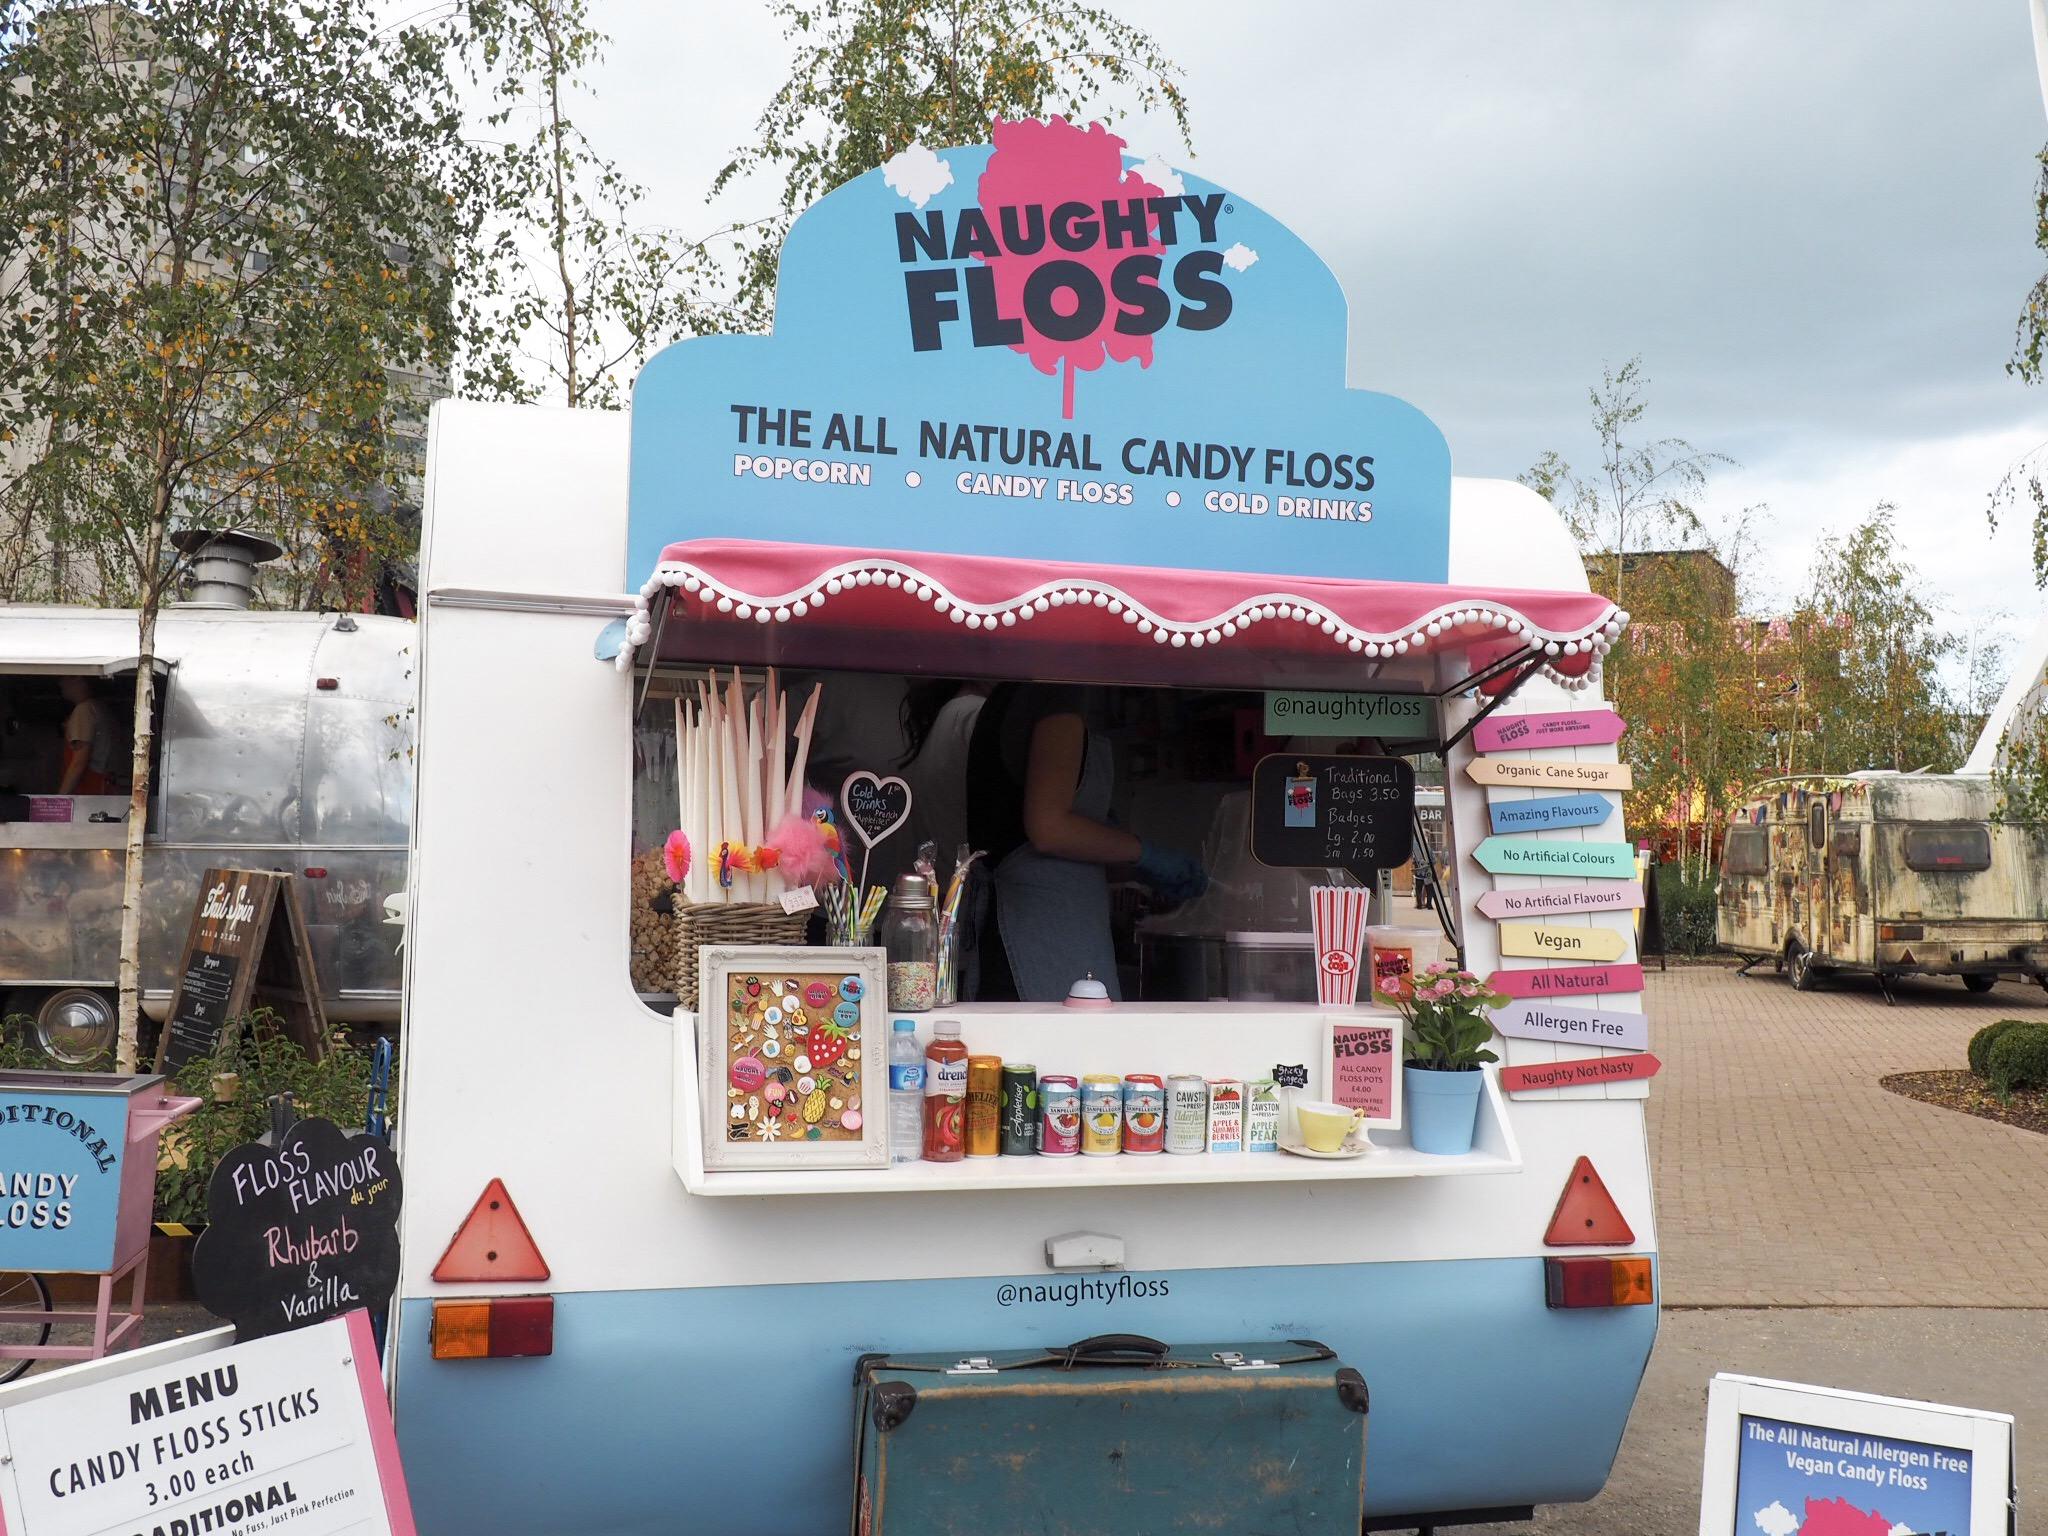 Naughty Floss candy floss